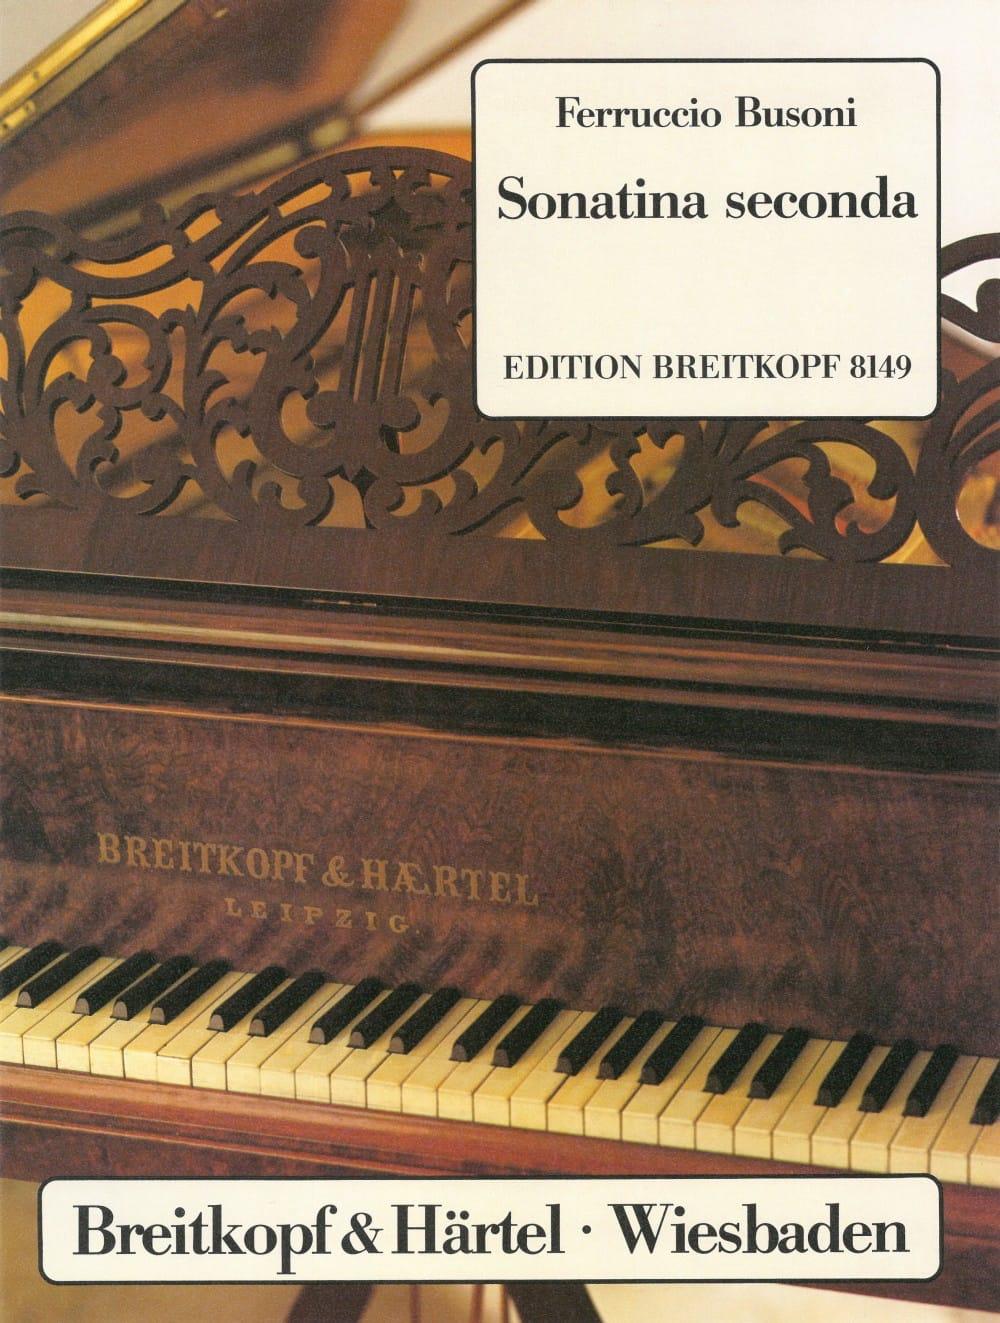 Sonatina Seconda Bv 259 - BUSONI - Partition - laflutedepan.com